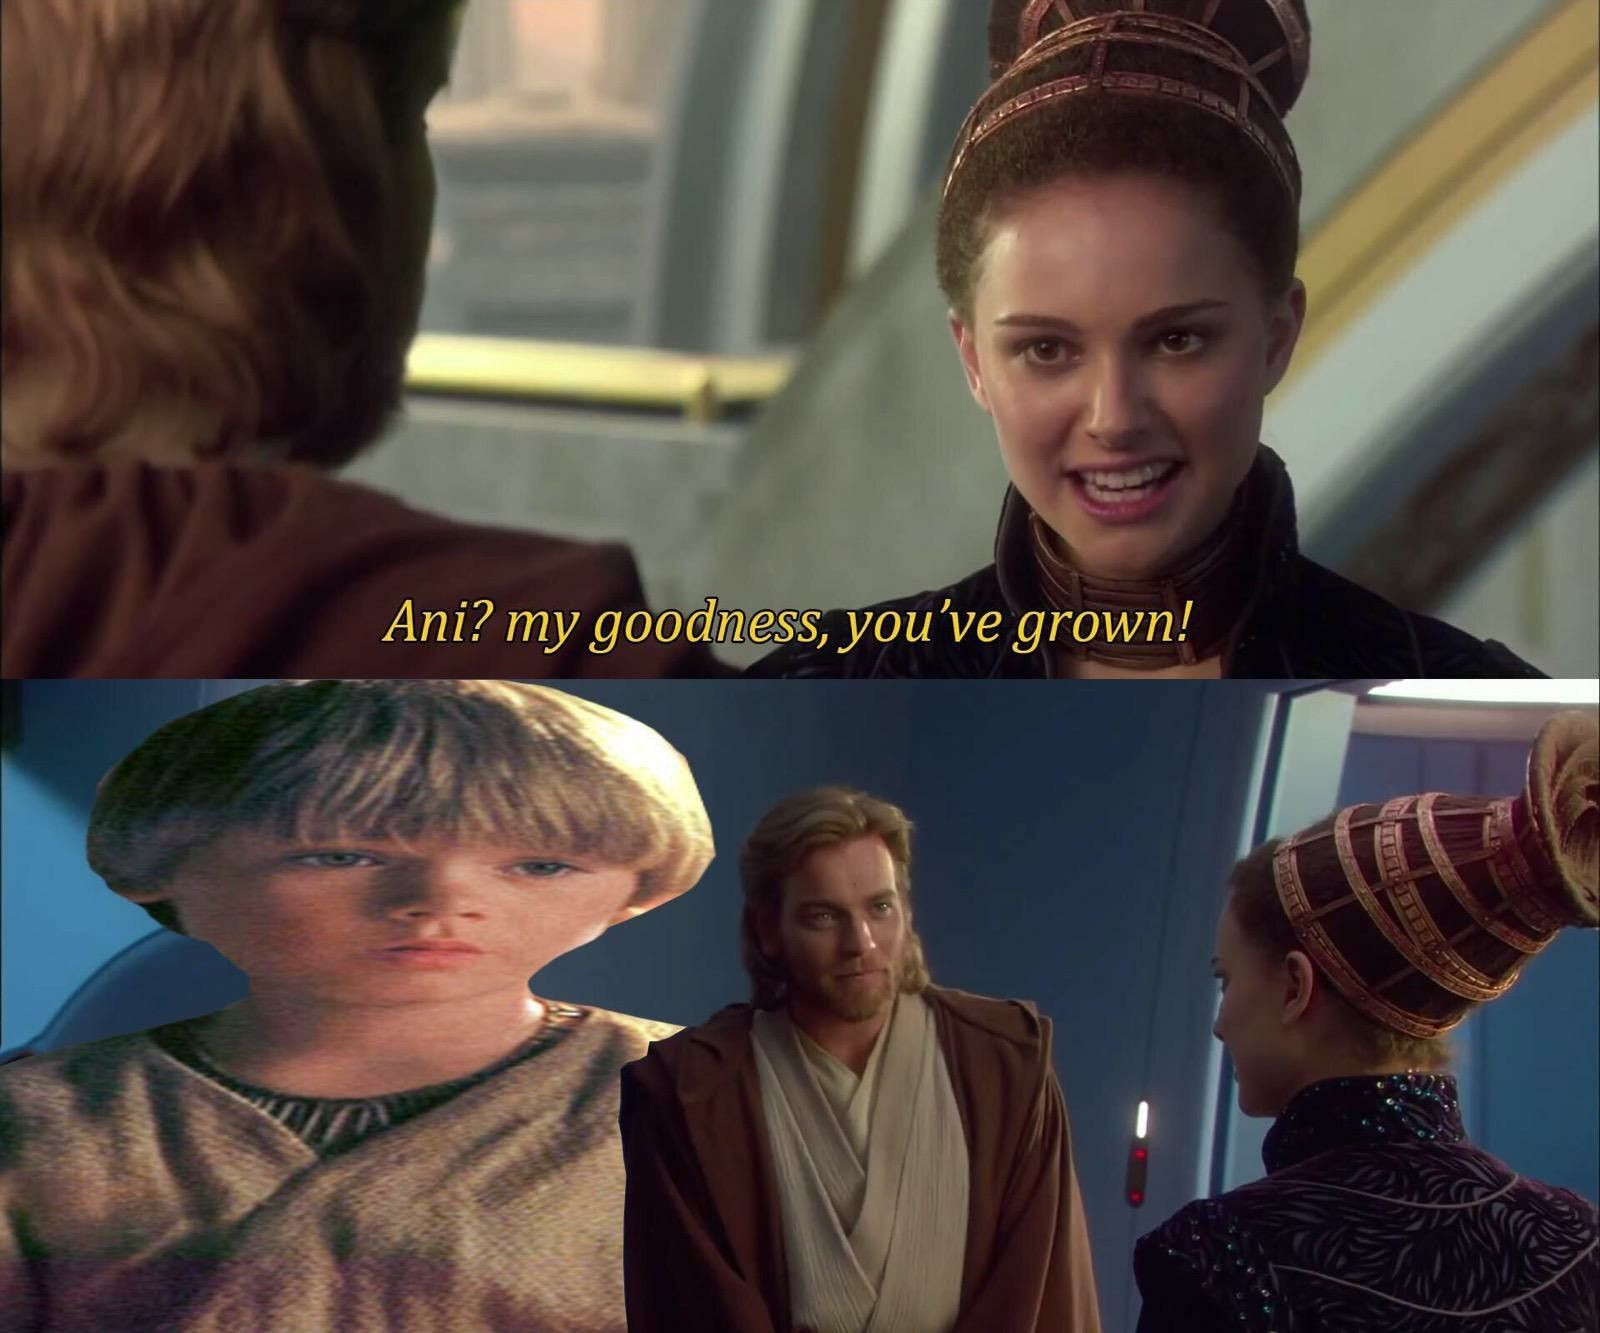 Palpatinedidnothingwrong Memes Starwars Starwarsmemes Meme Funny Anikan Padme Prequelmemes Ani Star Wars Humor Star Wars Quotes Funny Star Wars Memes